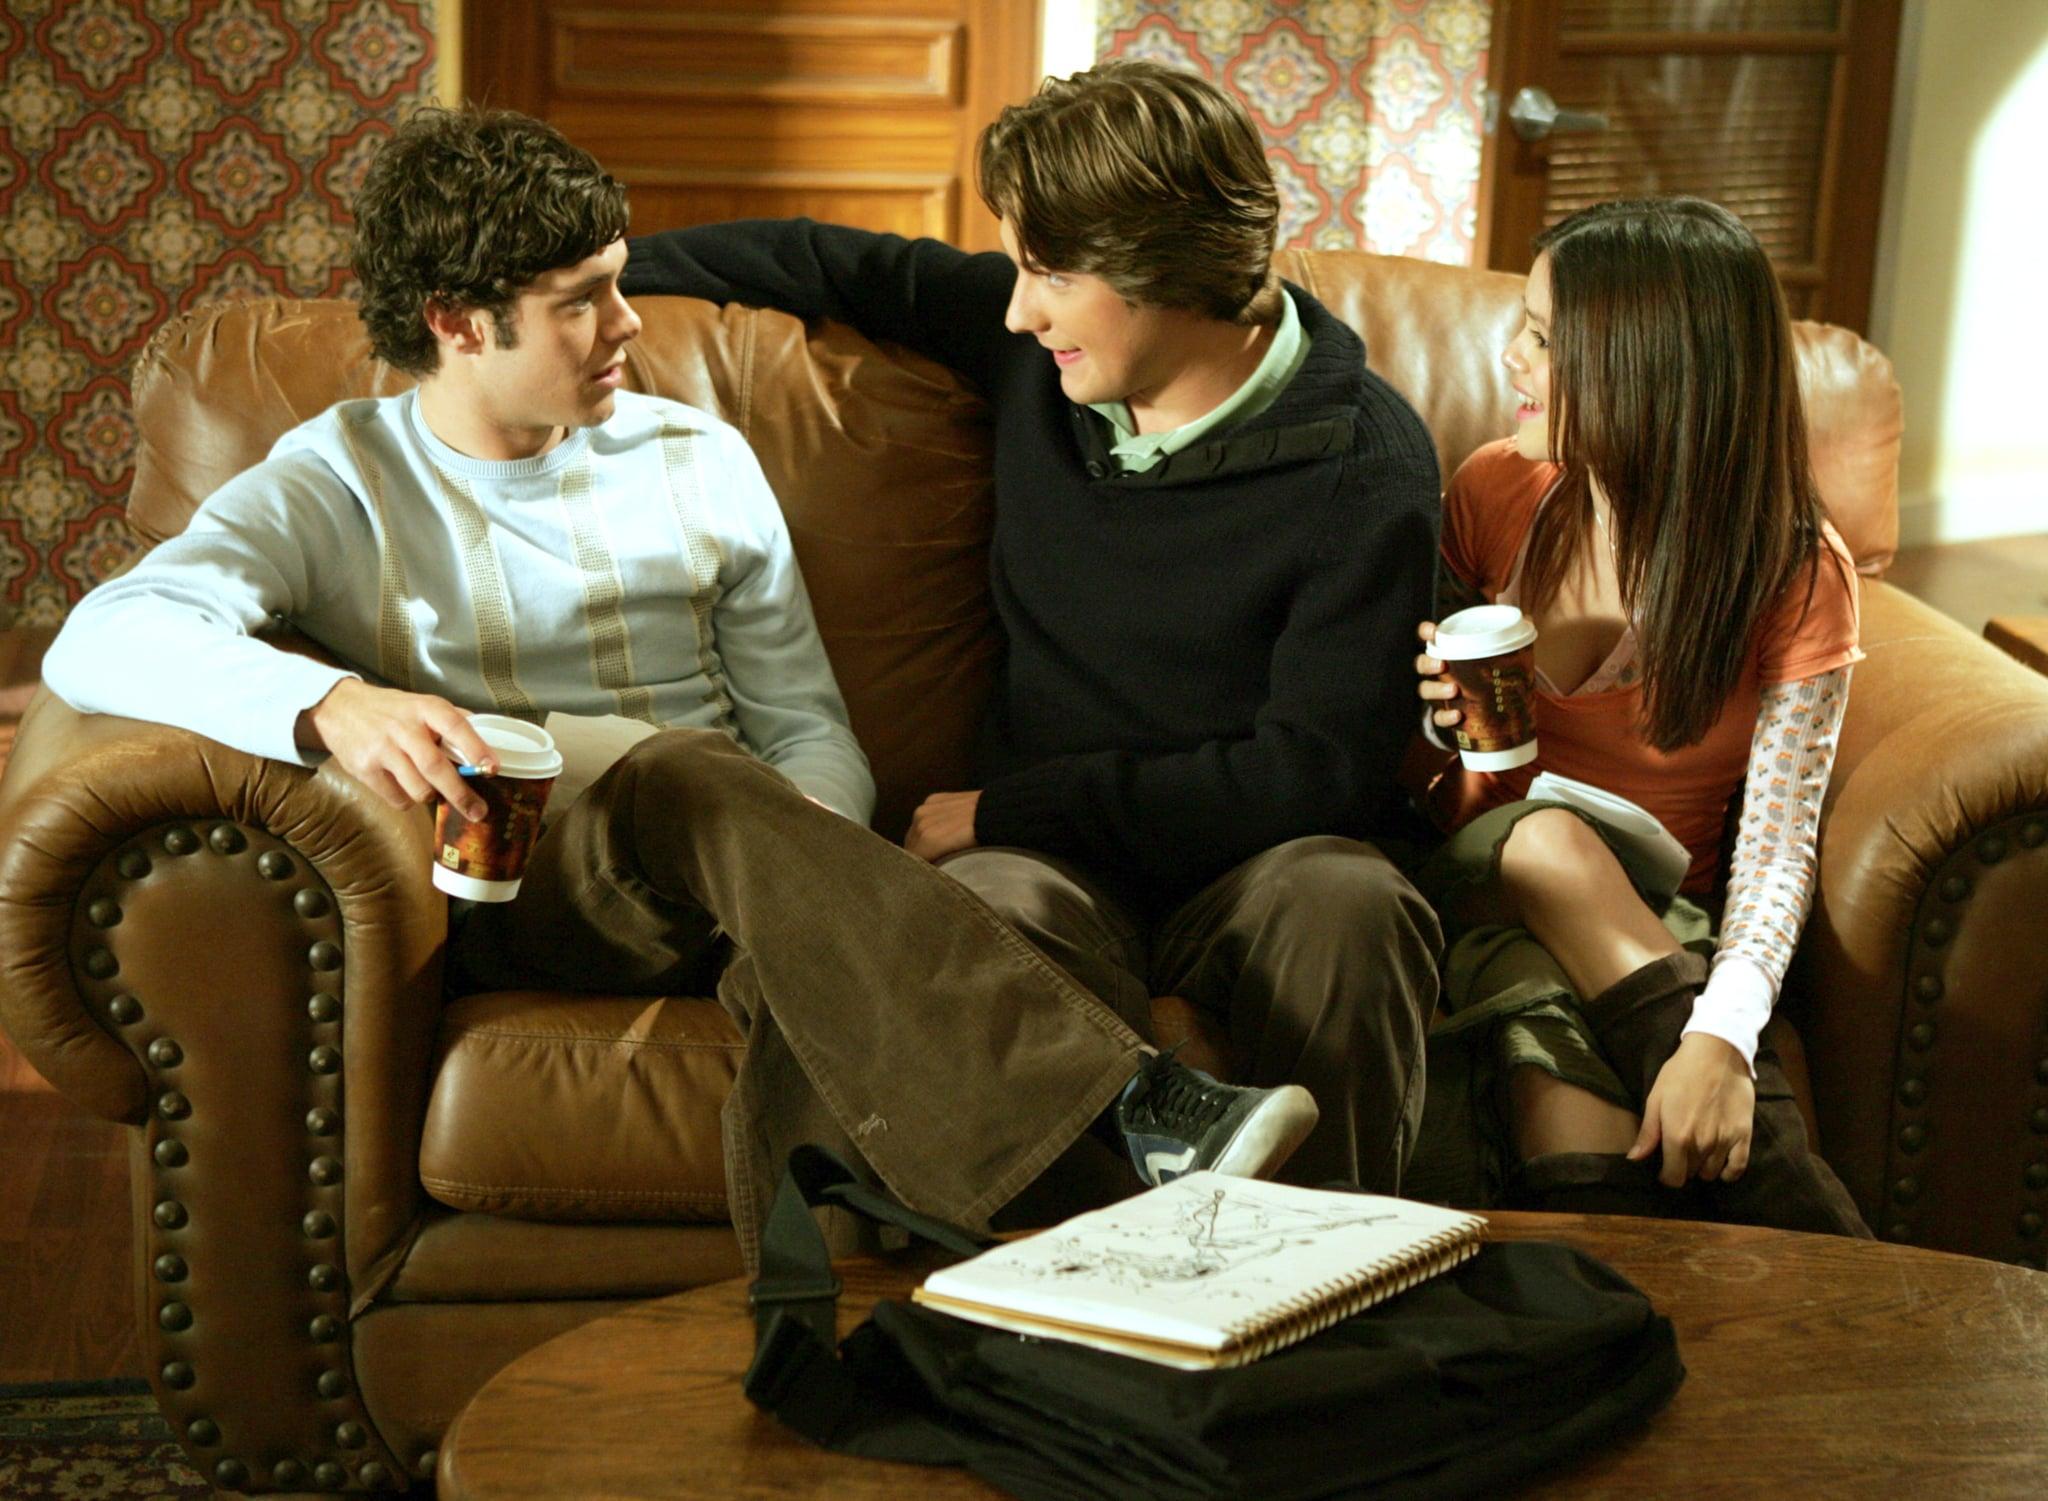 THE O.C., Adam Brody, Michael Cassidy, Rachel Bilson, 'The Second Chance', (Season 2, ep. #211), 2003-2007.  WB / Courtesy: Everett Collection